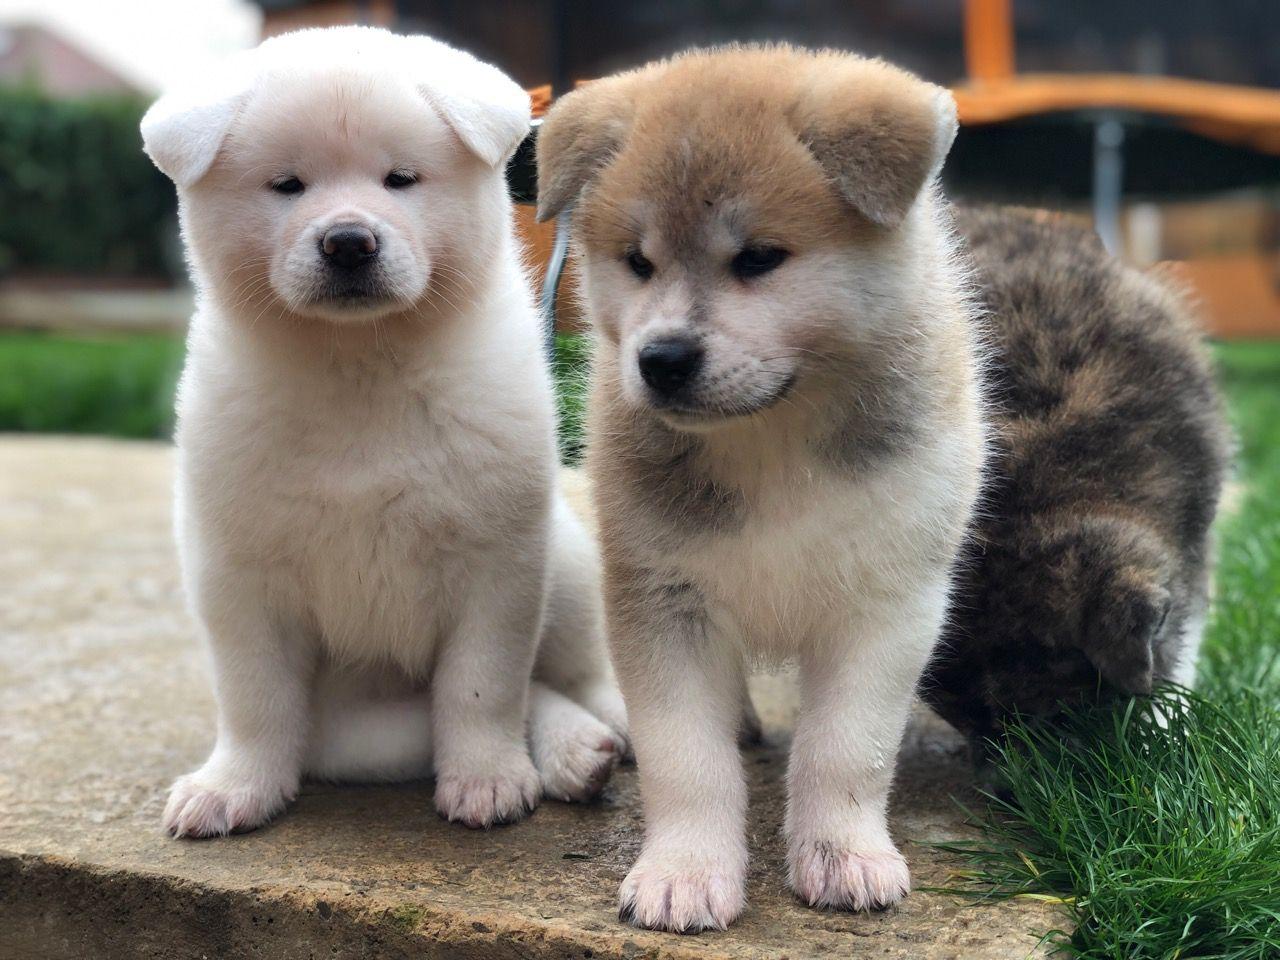 JapaneseAkitaInu-puppies-5da46a639adf9.jpg